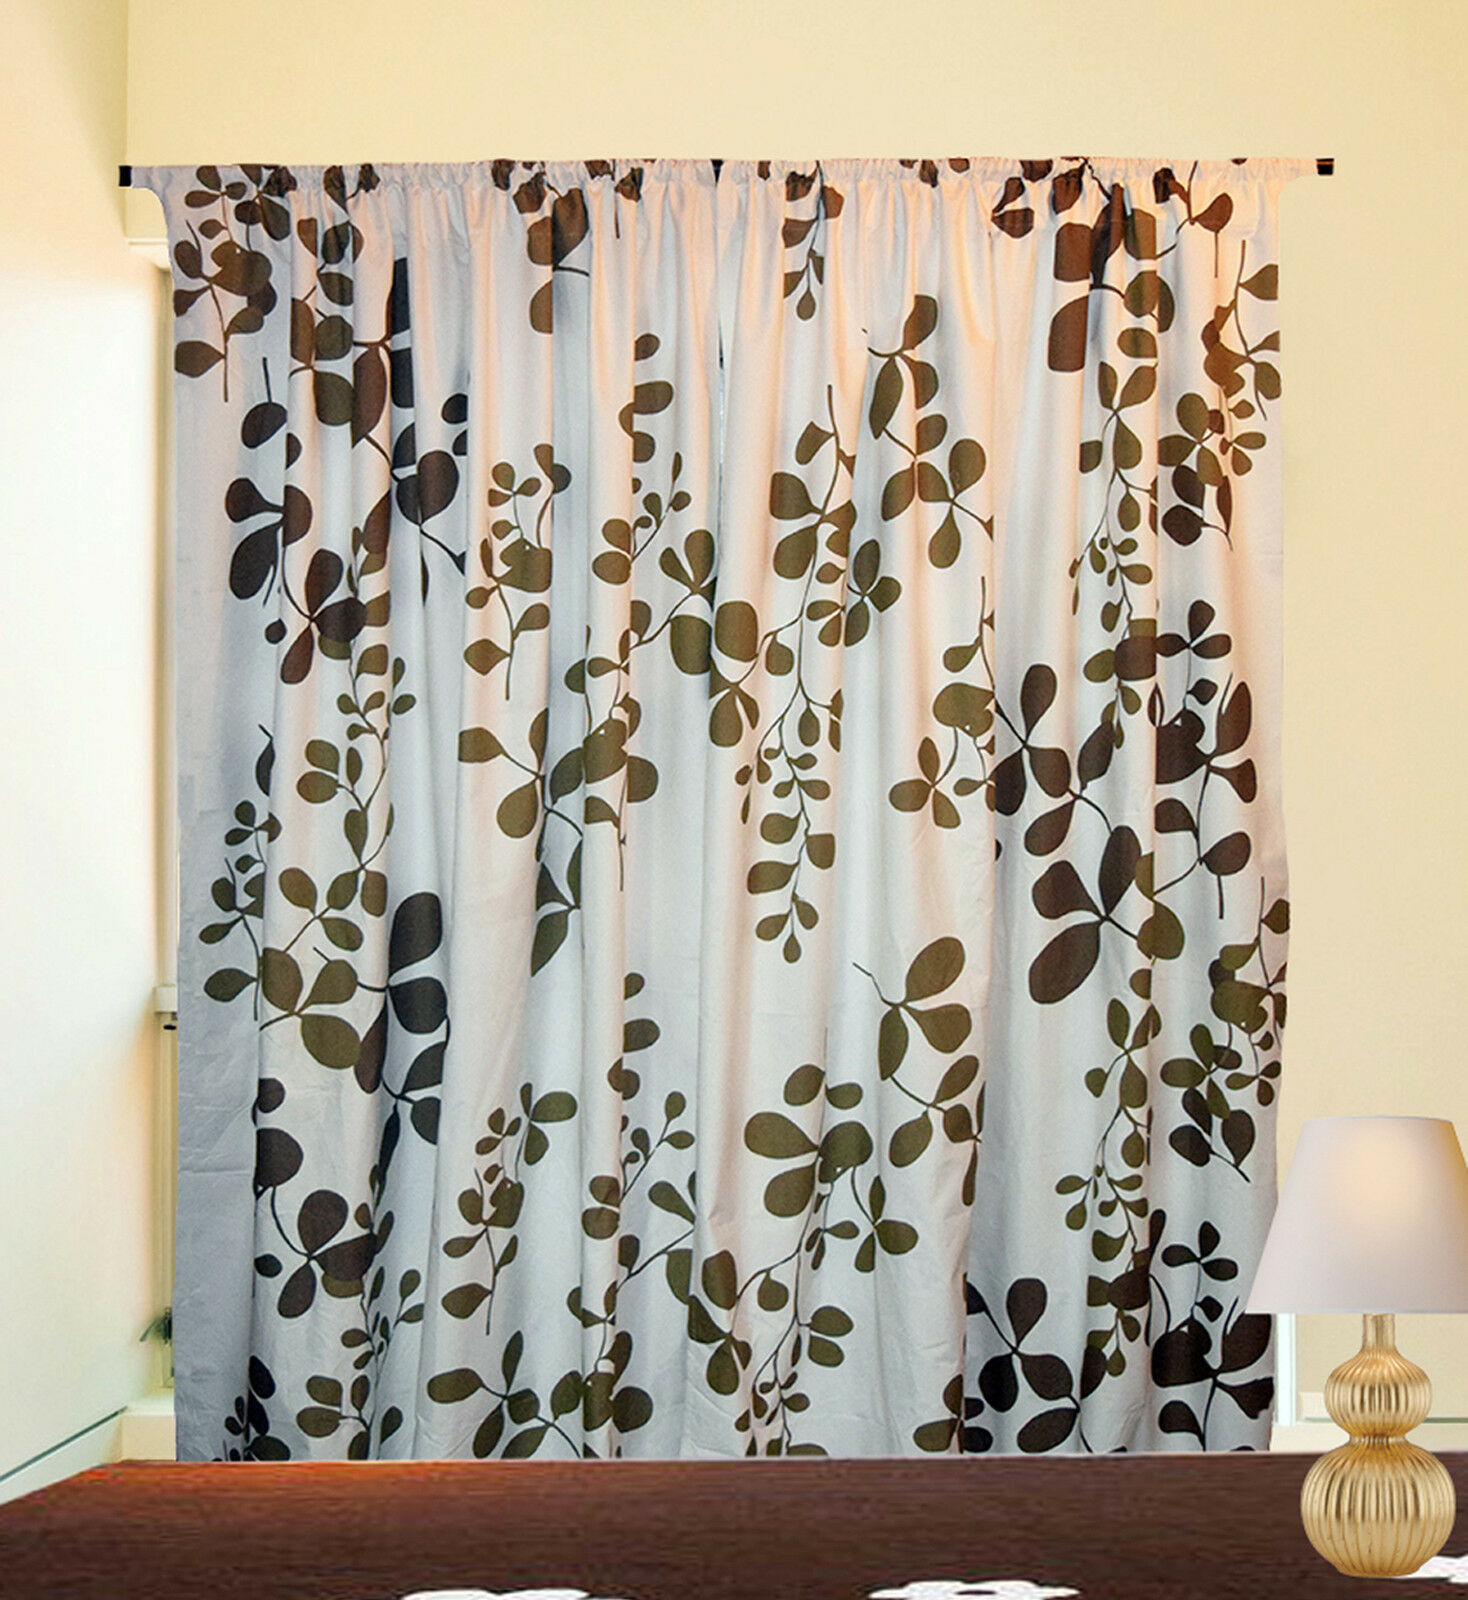 skylinewears blackout thermal insulated rod pocket window door curtain one panel ebay. Black Bedroom Furniture Sets. Home Design Ideas